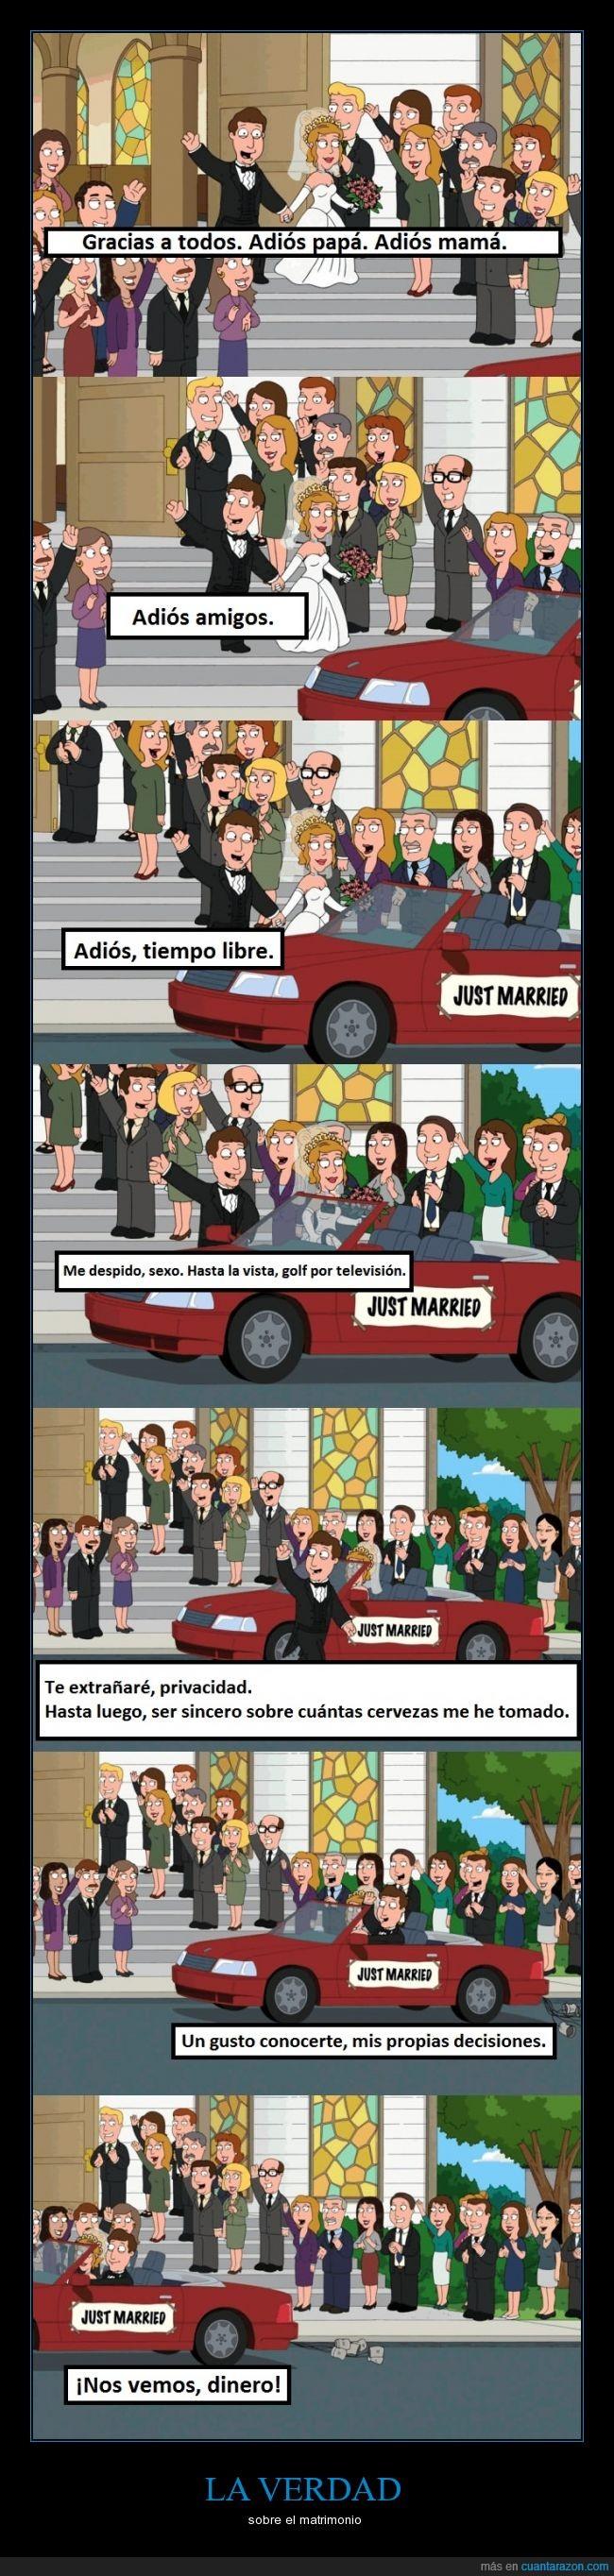 atado,casarse,despedirse,libertad,matrimonio,mujer,padre de familia,verdad